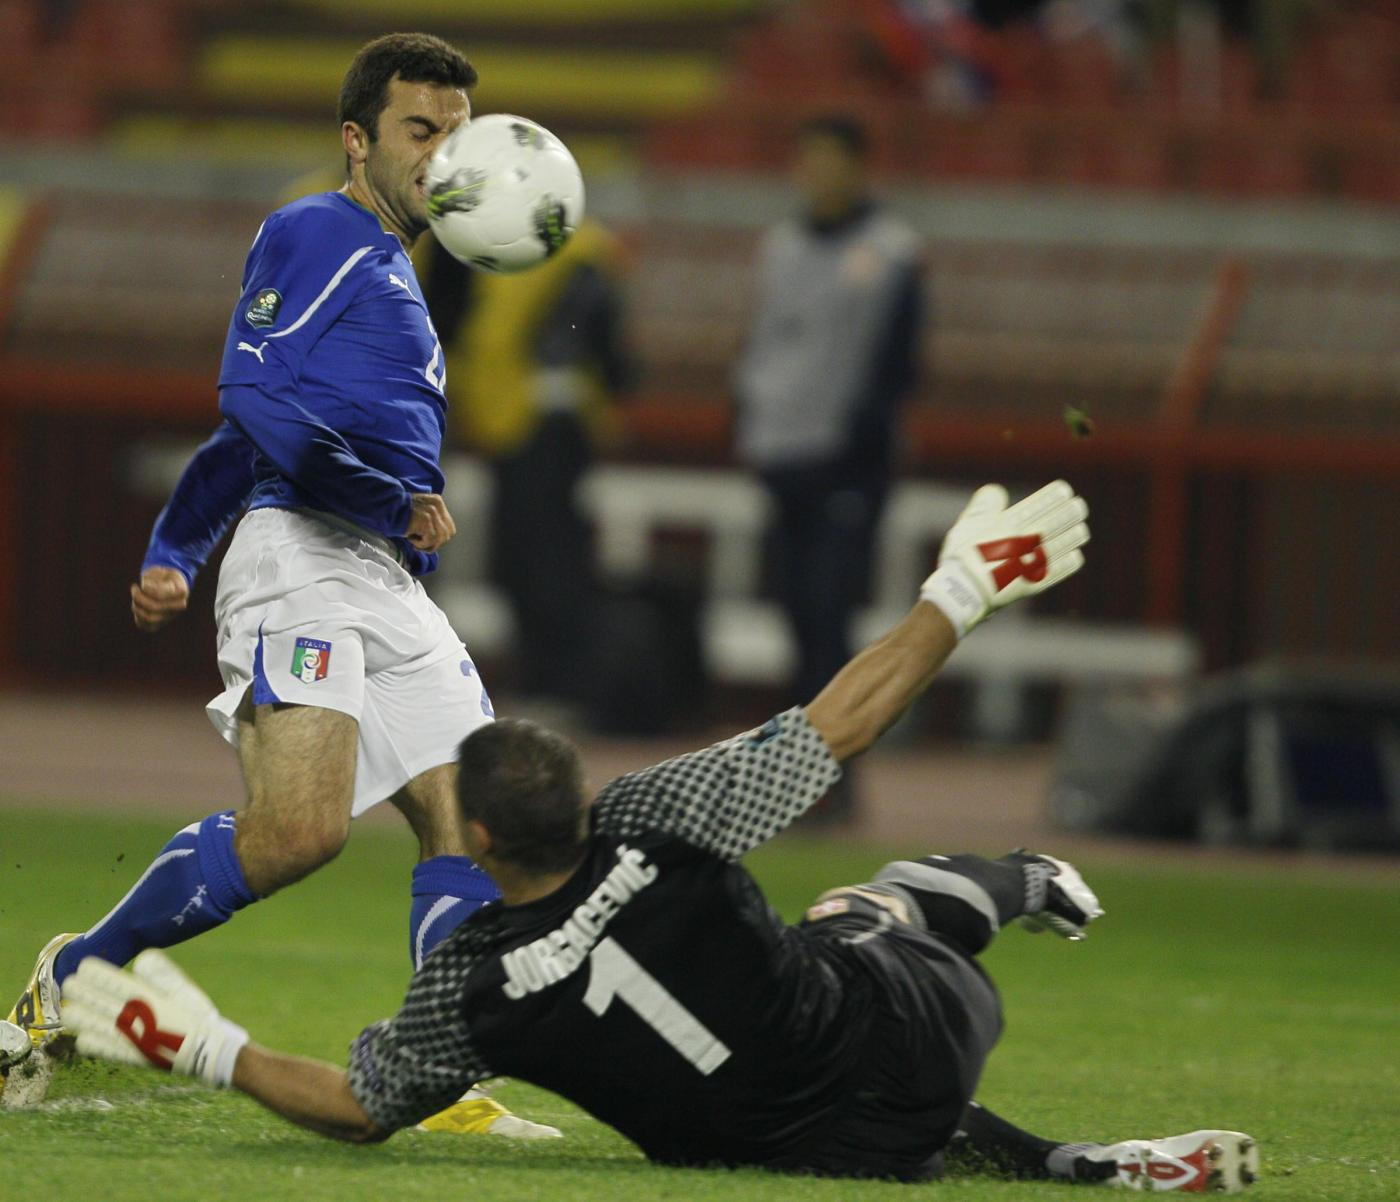 Ascolti tv venerdì 7 ottobre 2011: per Serbia-Italia 7,6 mln, Sangue Caldo a 4,1